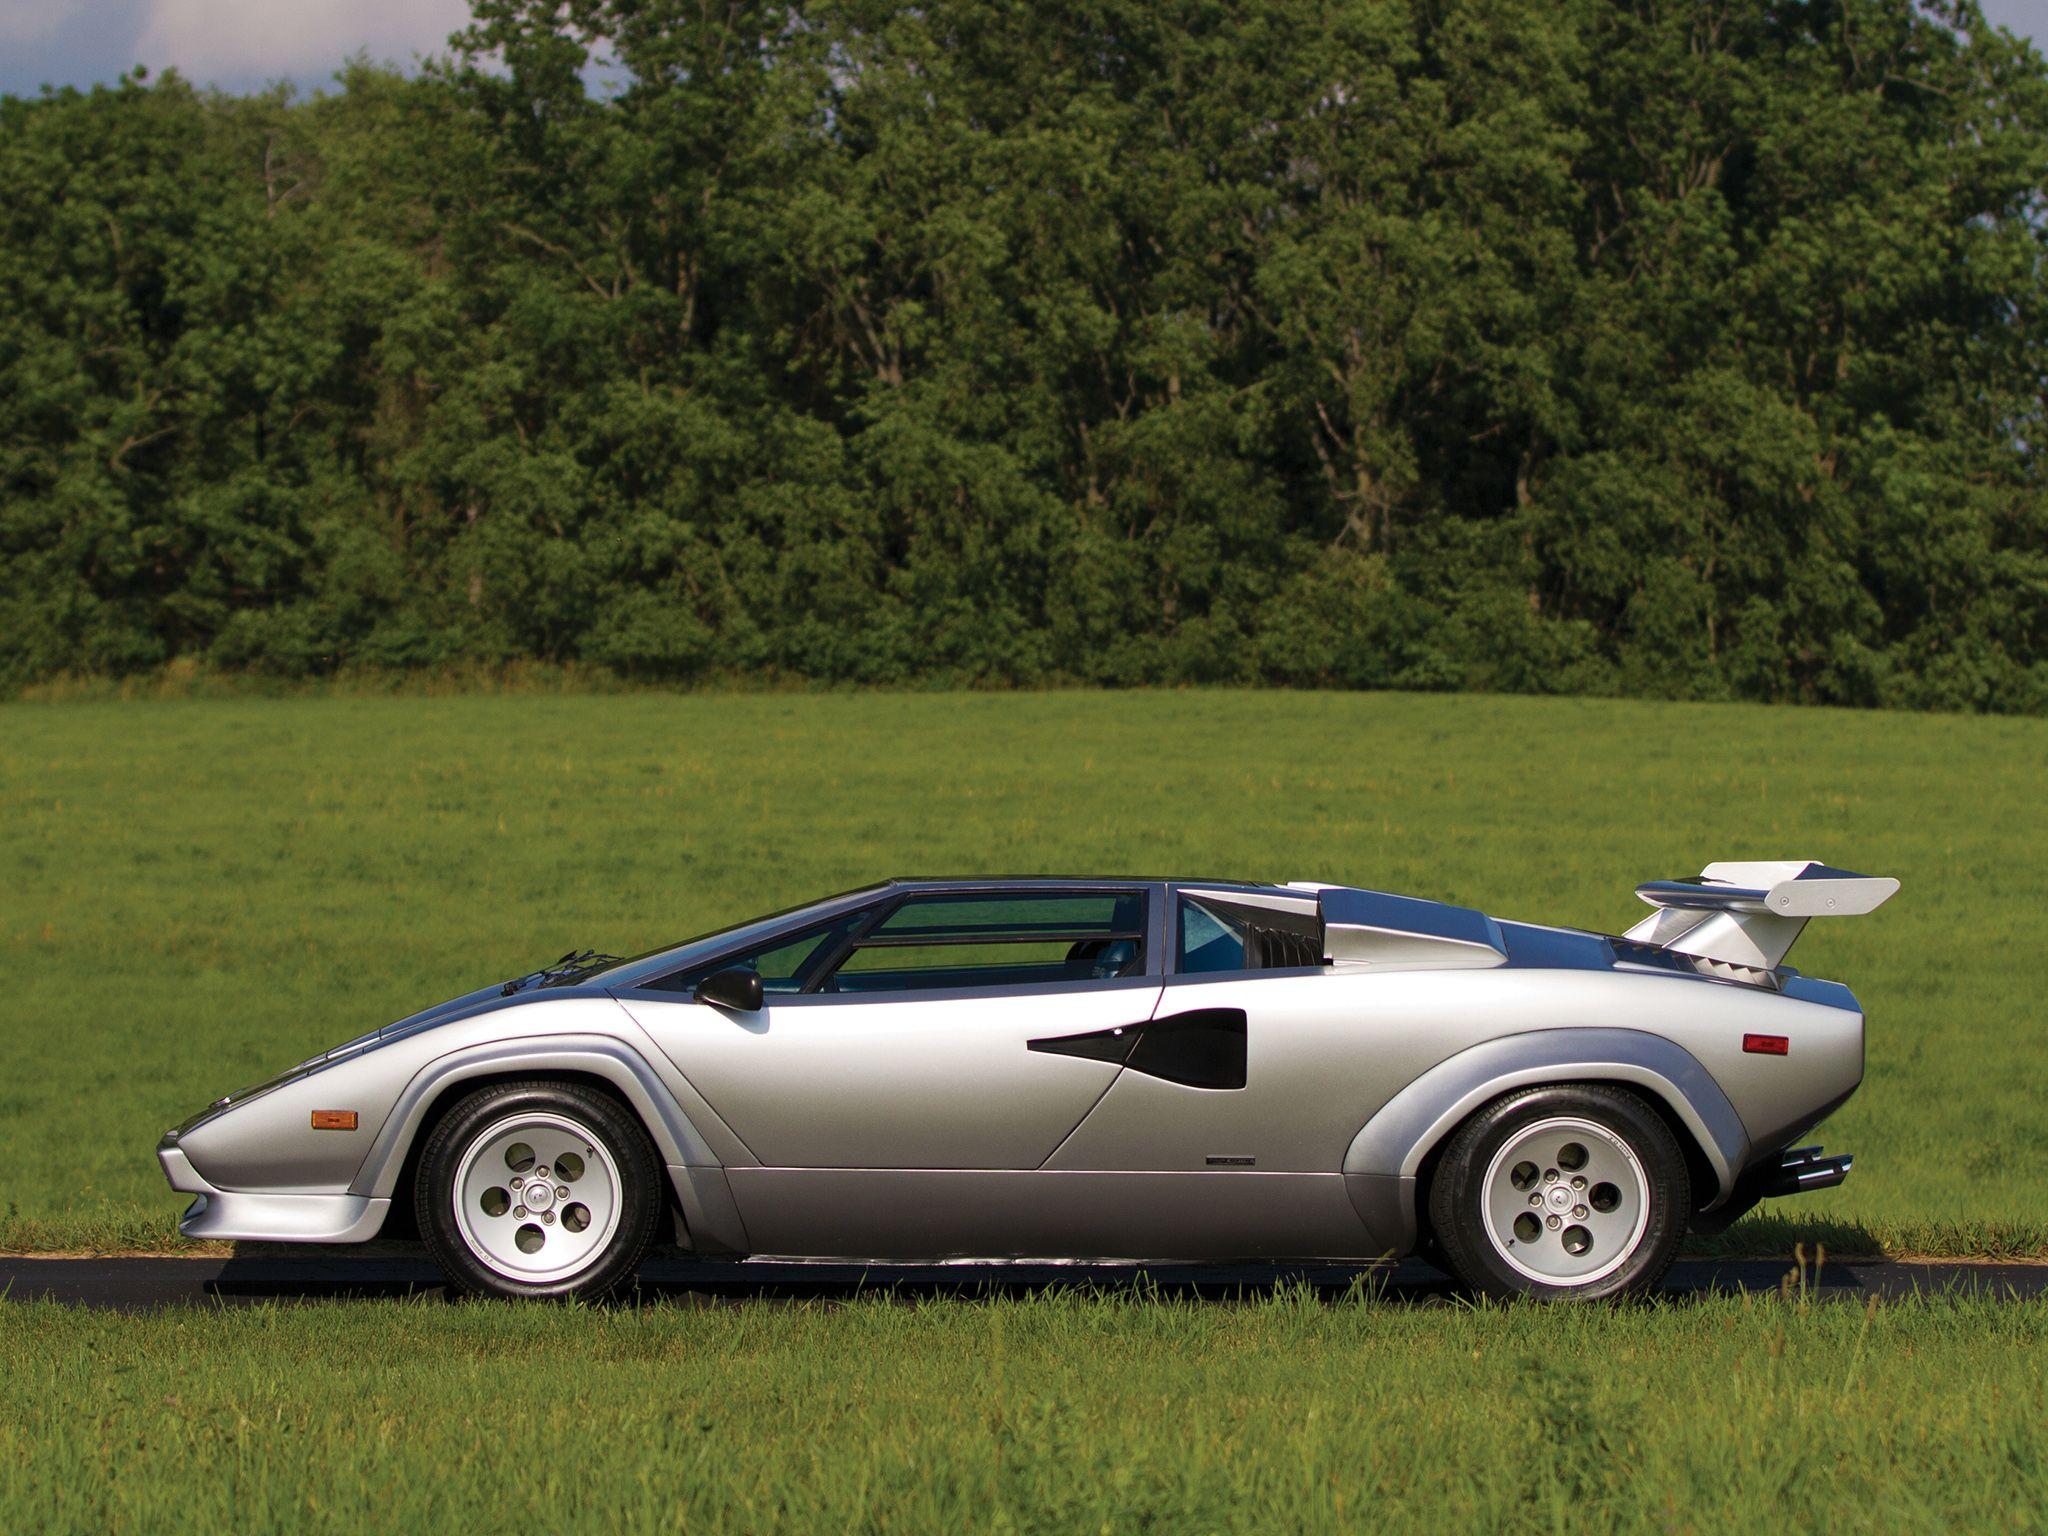 7dcc00dffe57a05a7a42b14e812228a8 Extraordinary Lamborghini Countach 5000 Quattrovalvole Specs Cars Trend